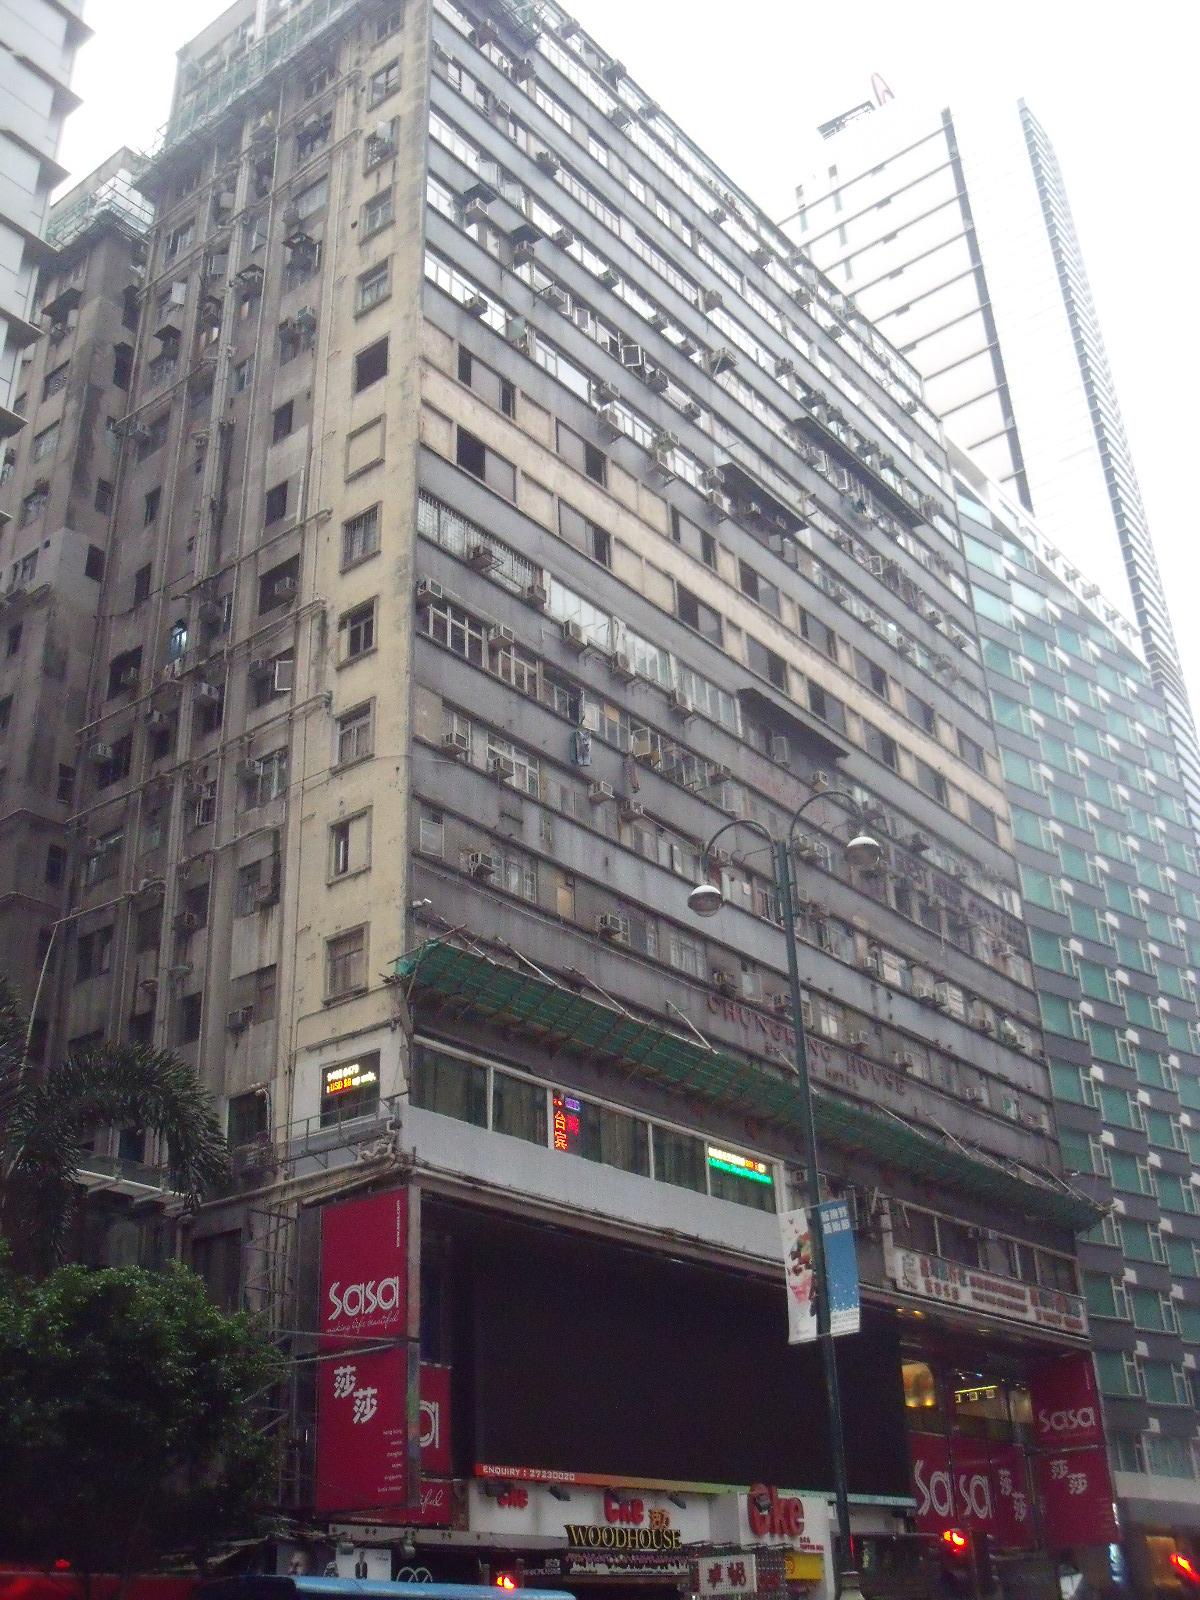 Glamorous Chungking Mansions